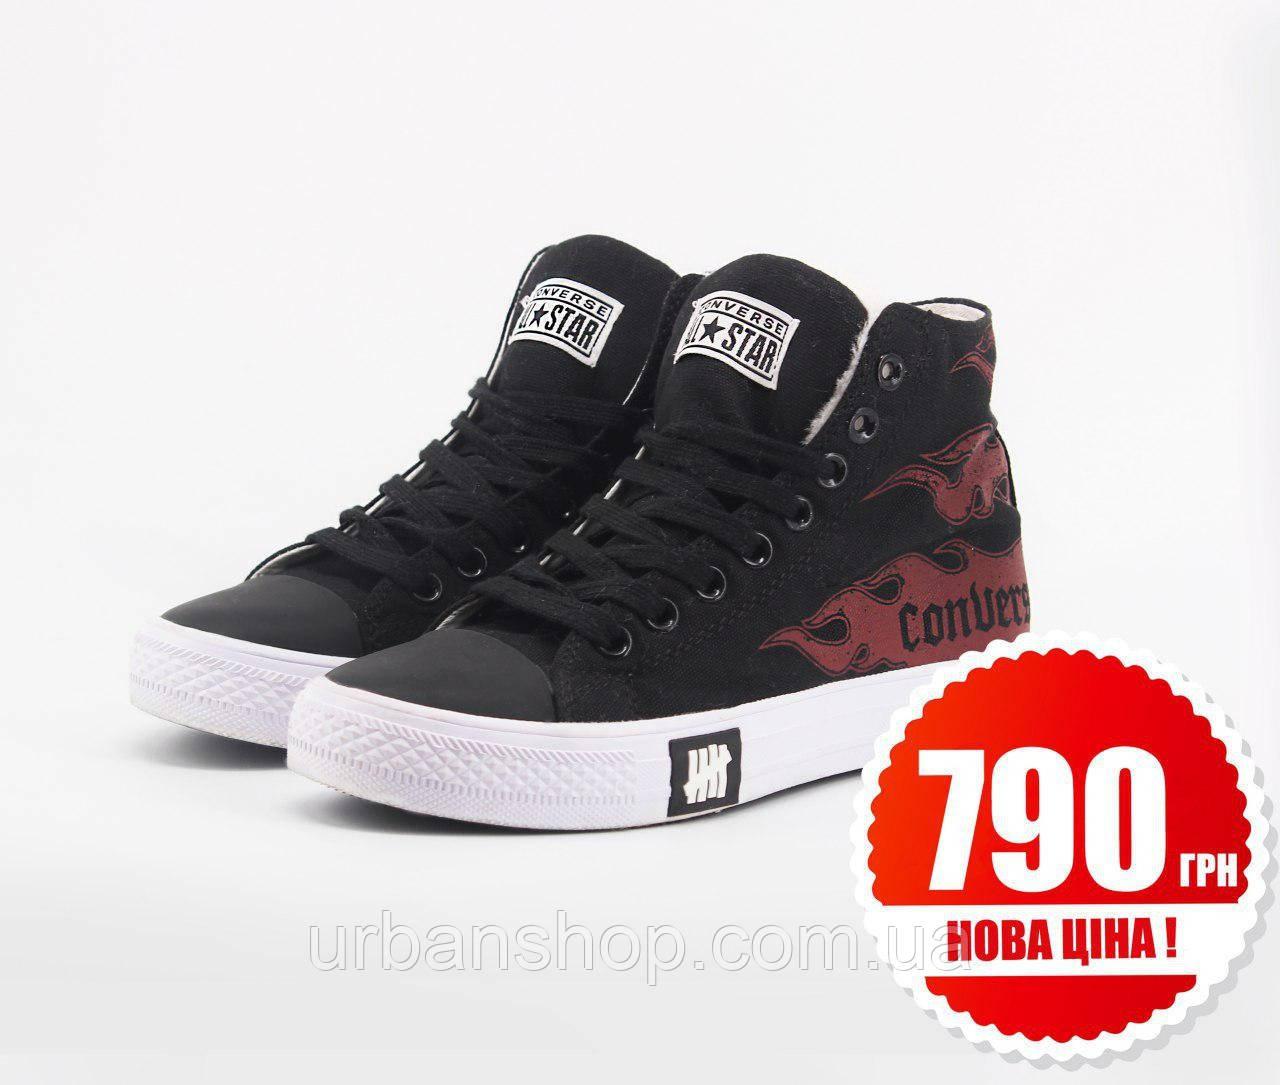 Взуття Converse x Undefeated High Black Red